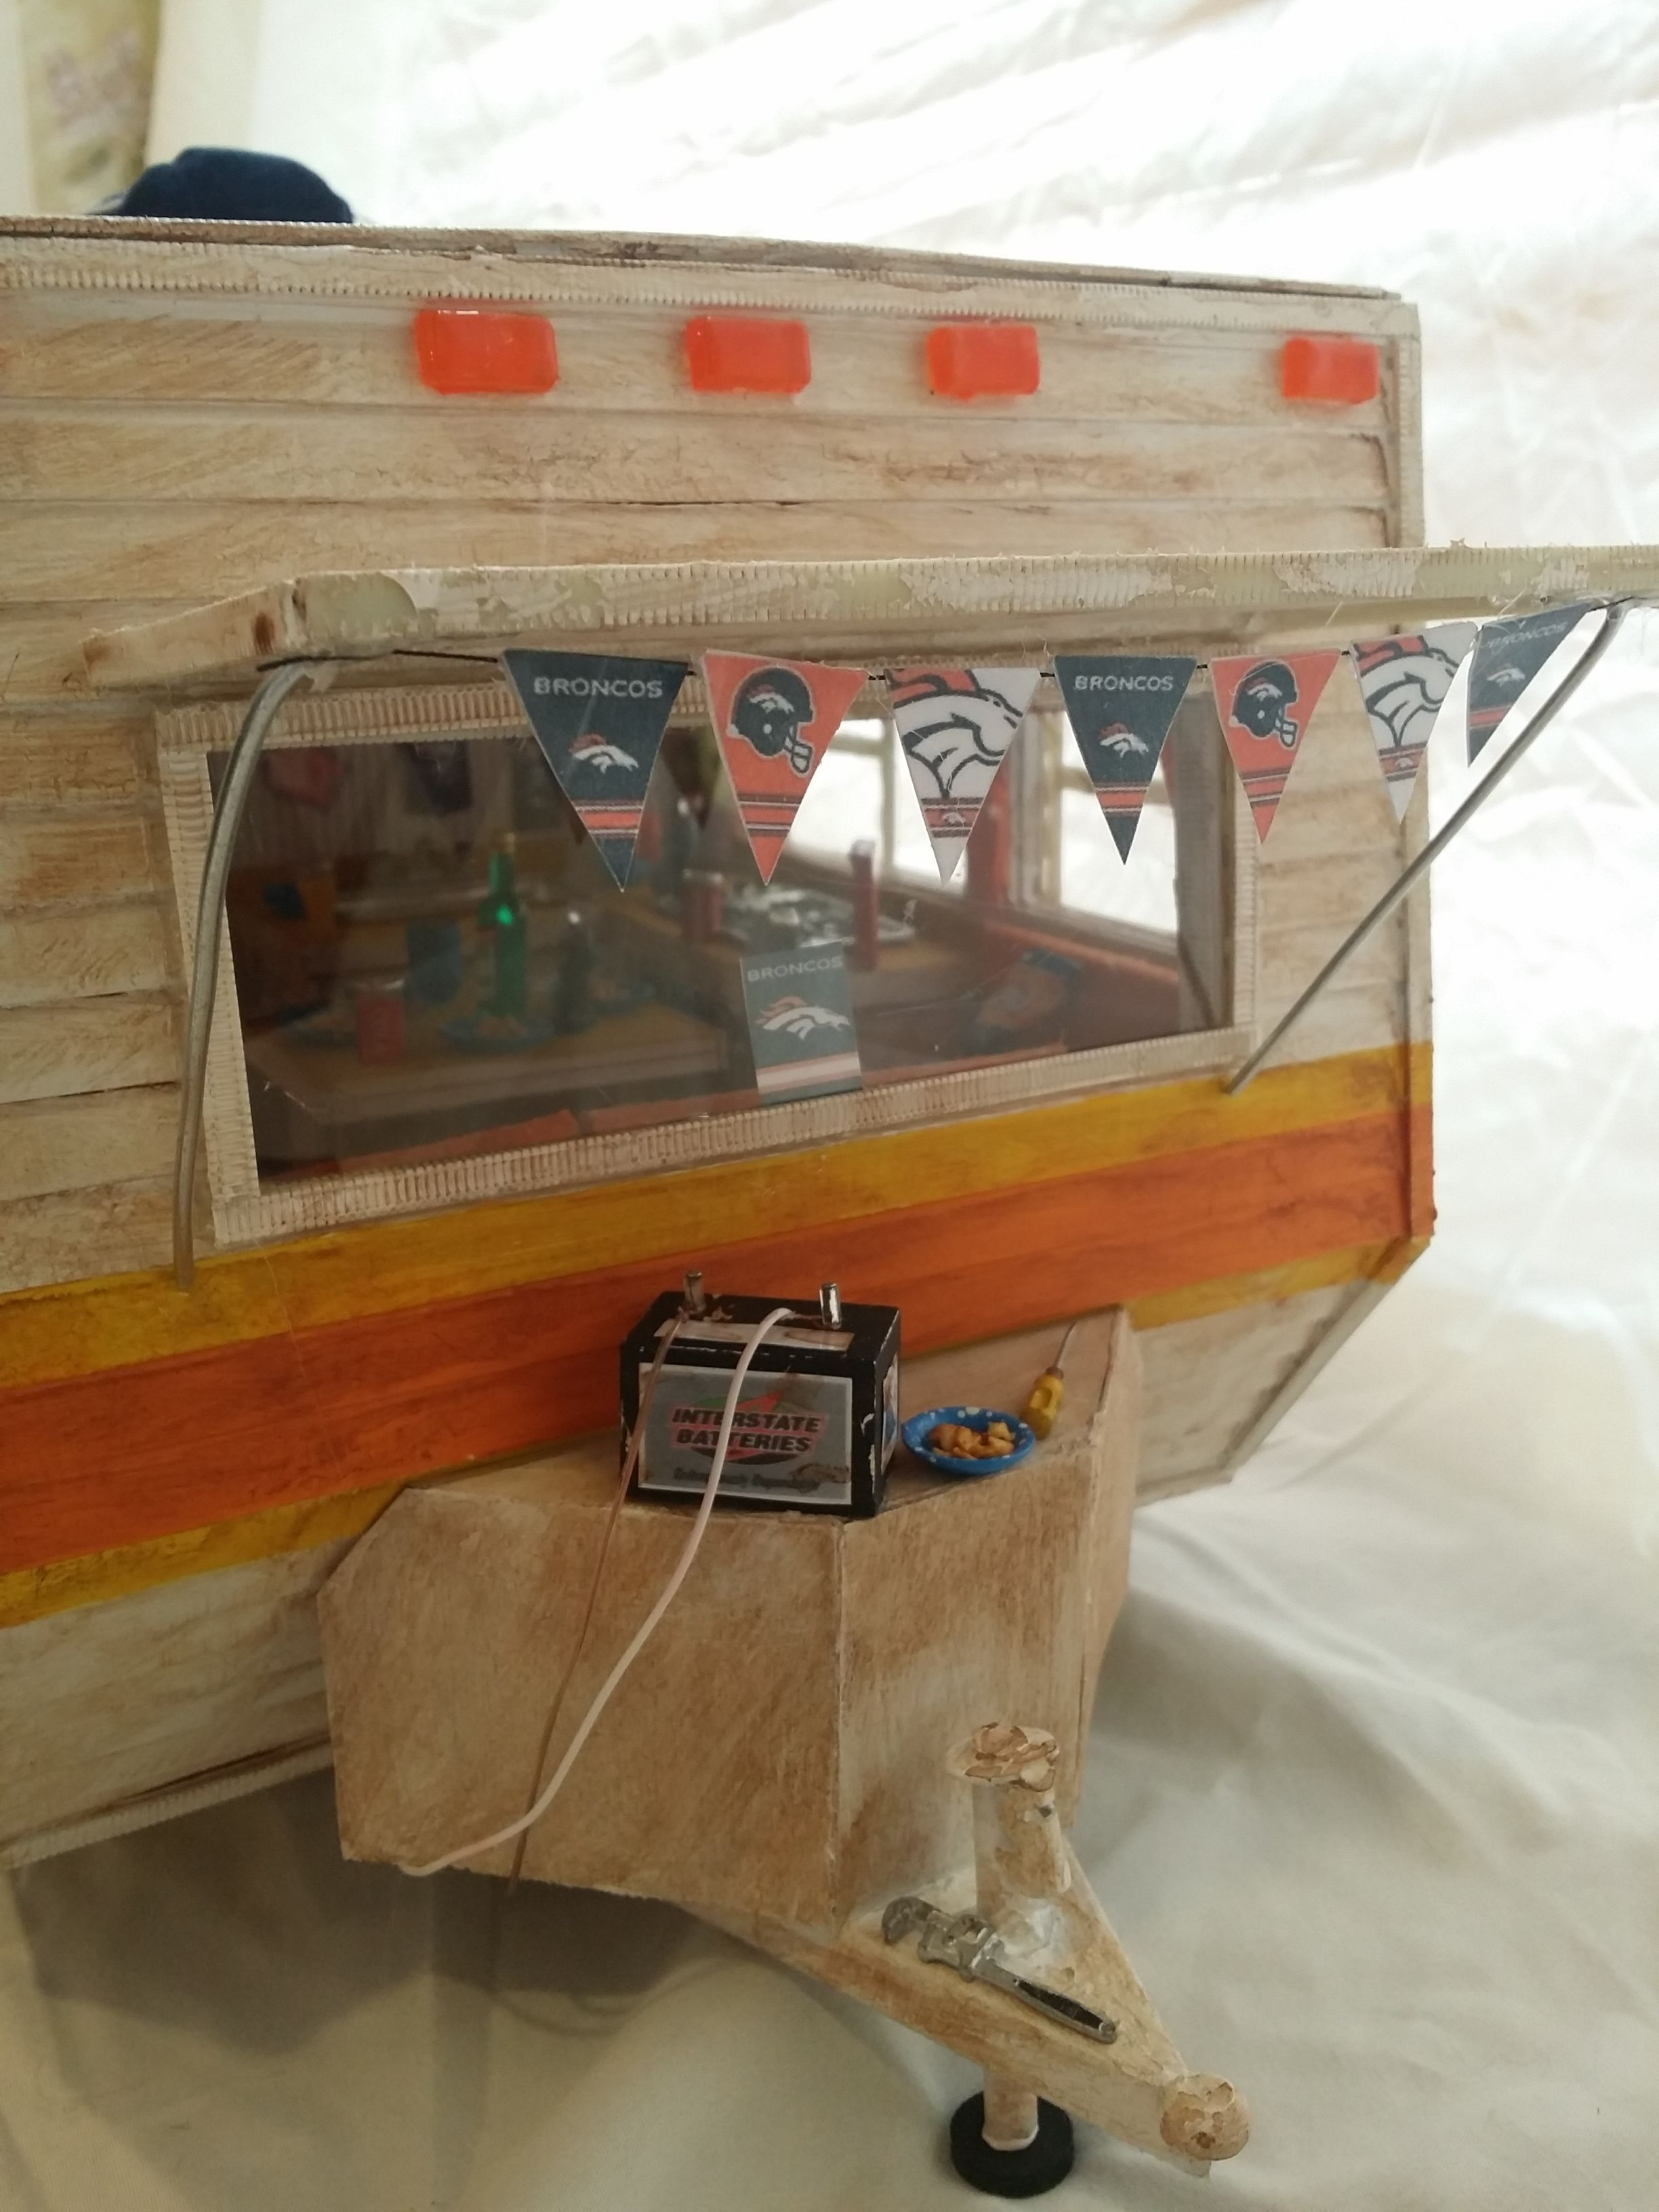 Miniature Bronco Party Travel Trailer from greggsminiatureimaginations.blogspot.com